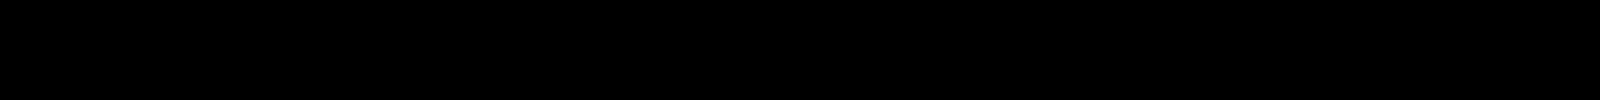 Fez Cipher Alphabet Fontstruct